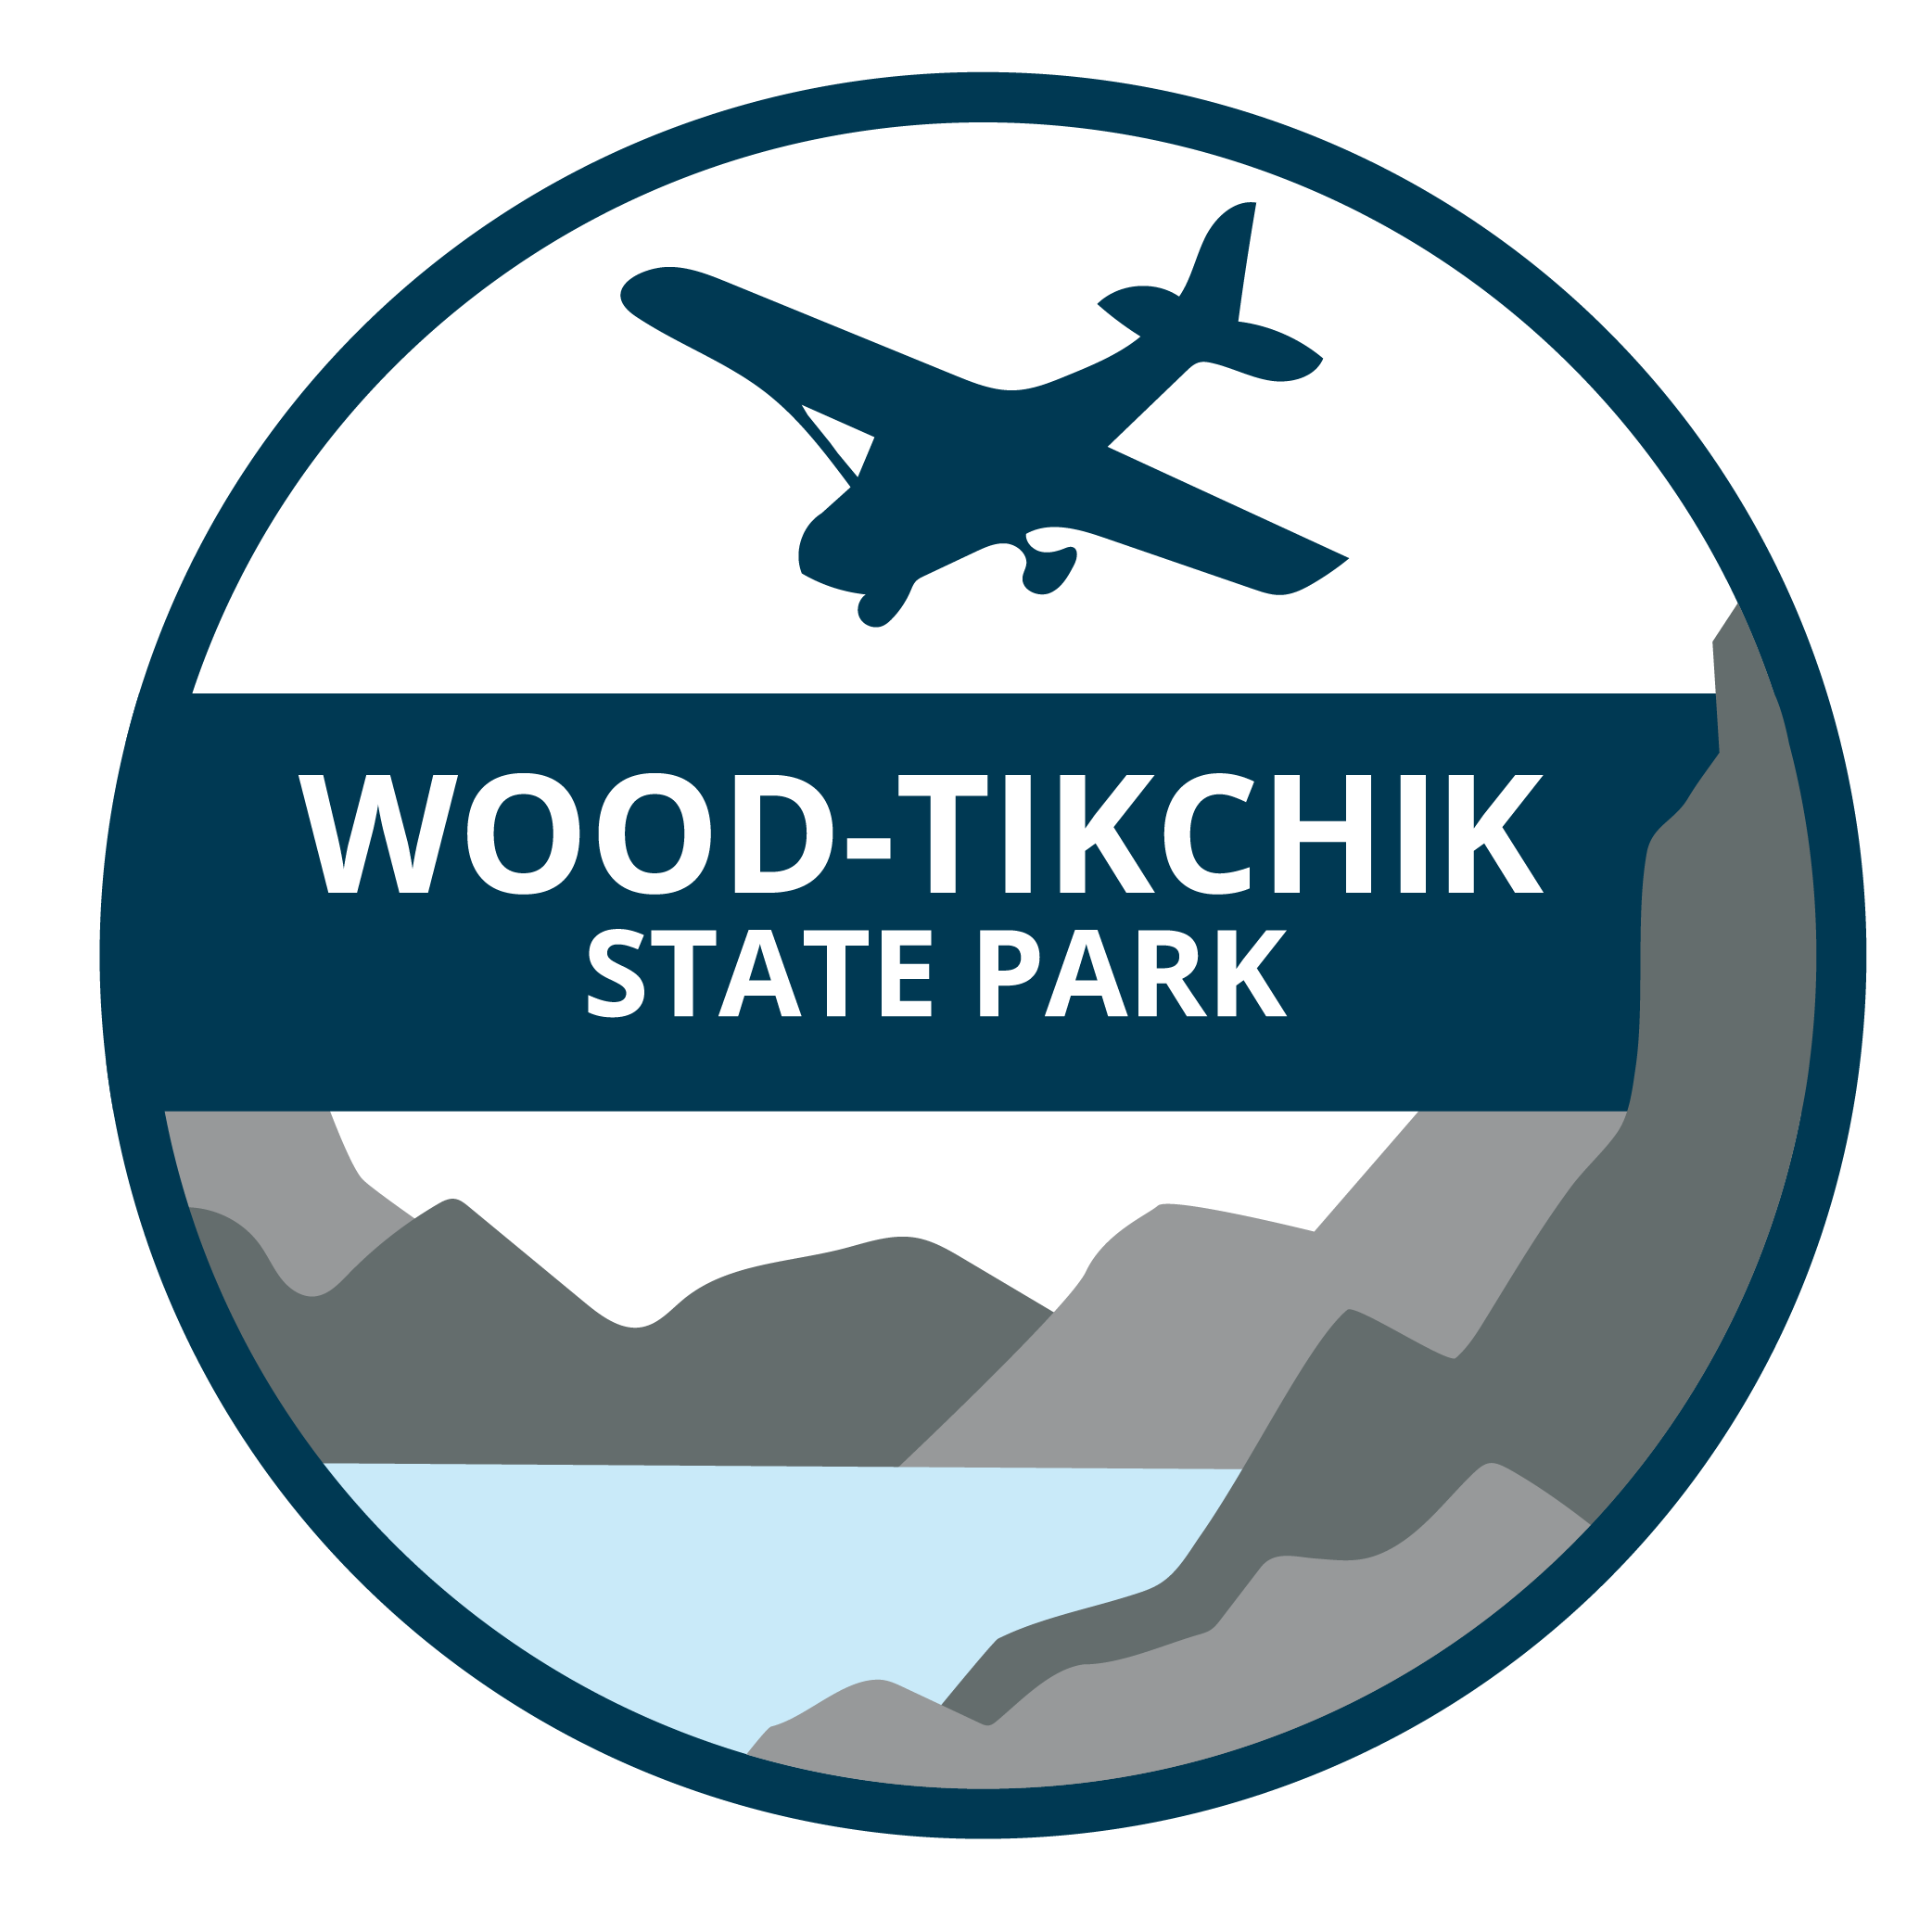 Wood-Tikchik State Park